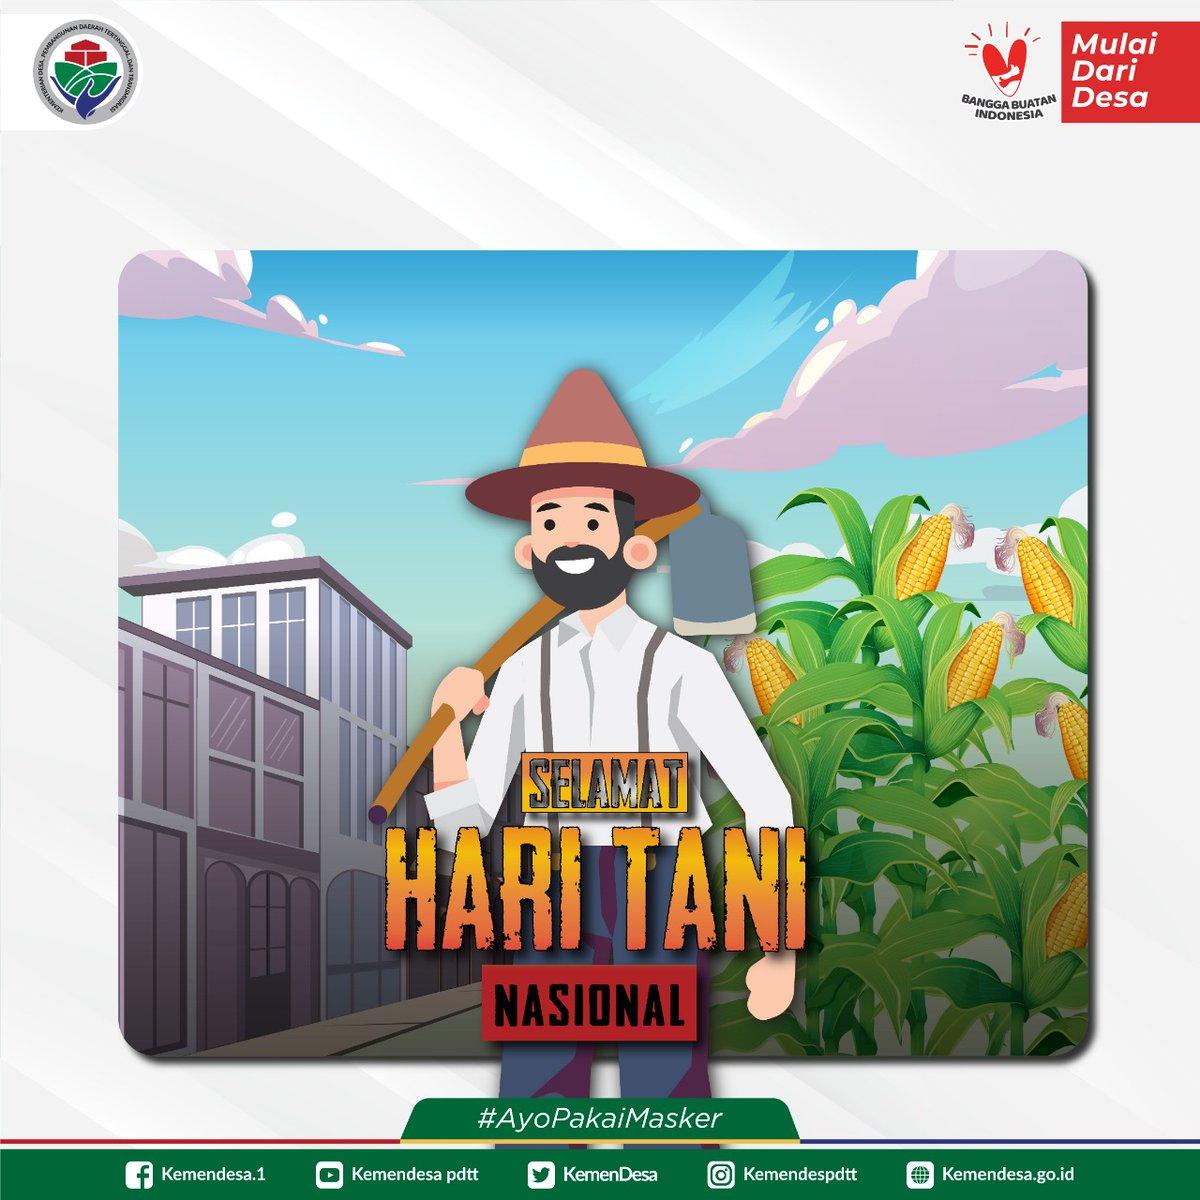 Selamat Hari Tani Nasional, para petani hebat Indonesia.  Semoga dapat mewujudkan ketahanan pangan bangsa di tengah Pandemi Covid-19.  #ExploreDesa #DesaBisa #MulaiDariDesa #DesaMajuIndonesiaMaju #KemendesPDTT https://t.co/xnZnBb76C7